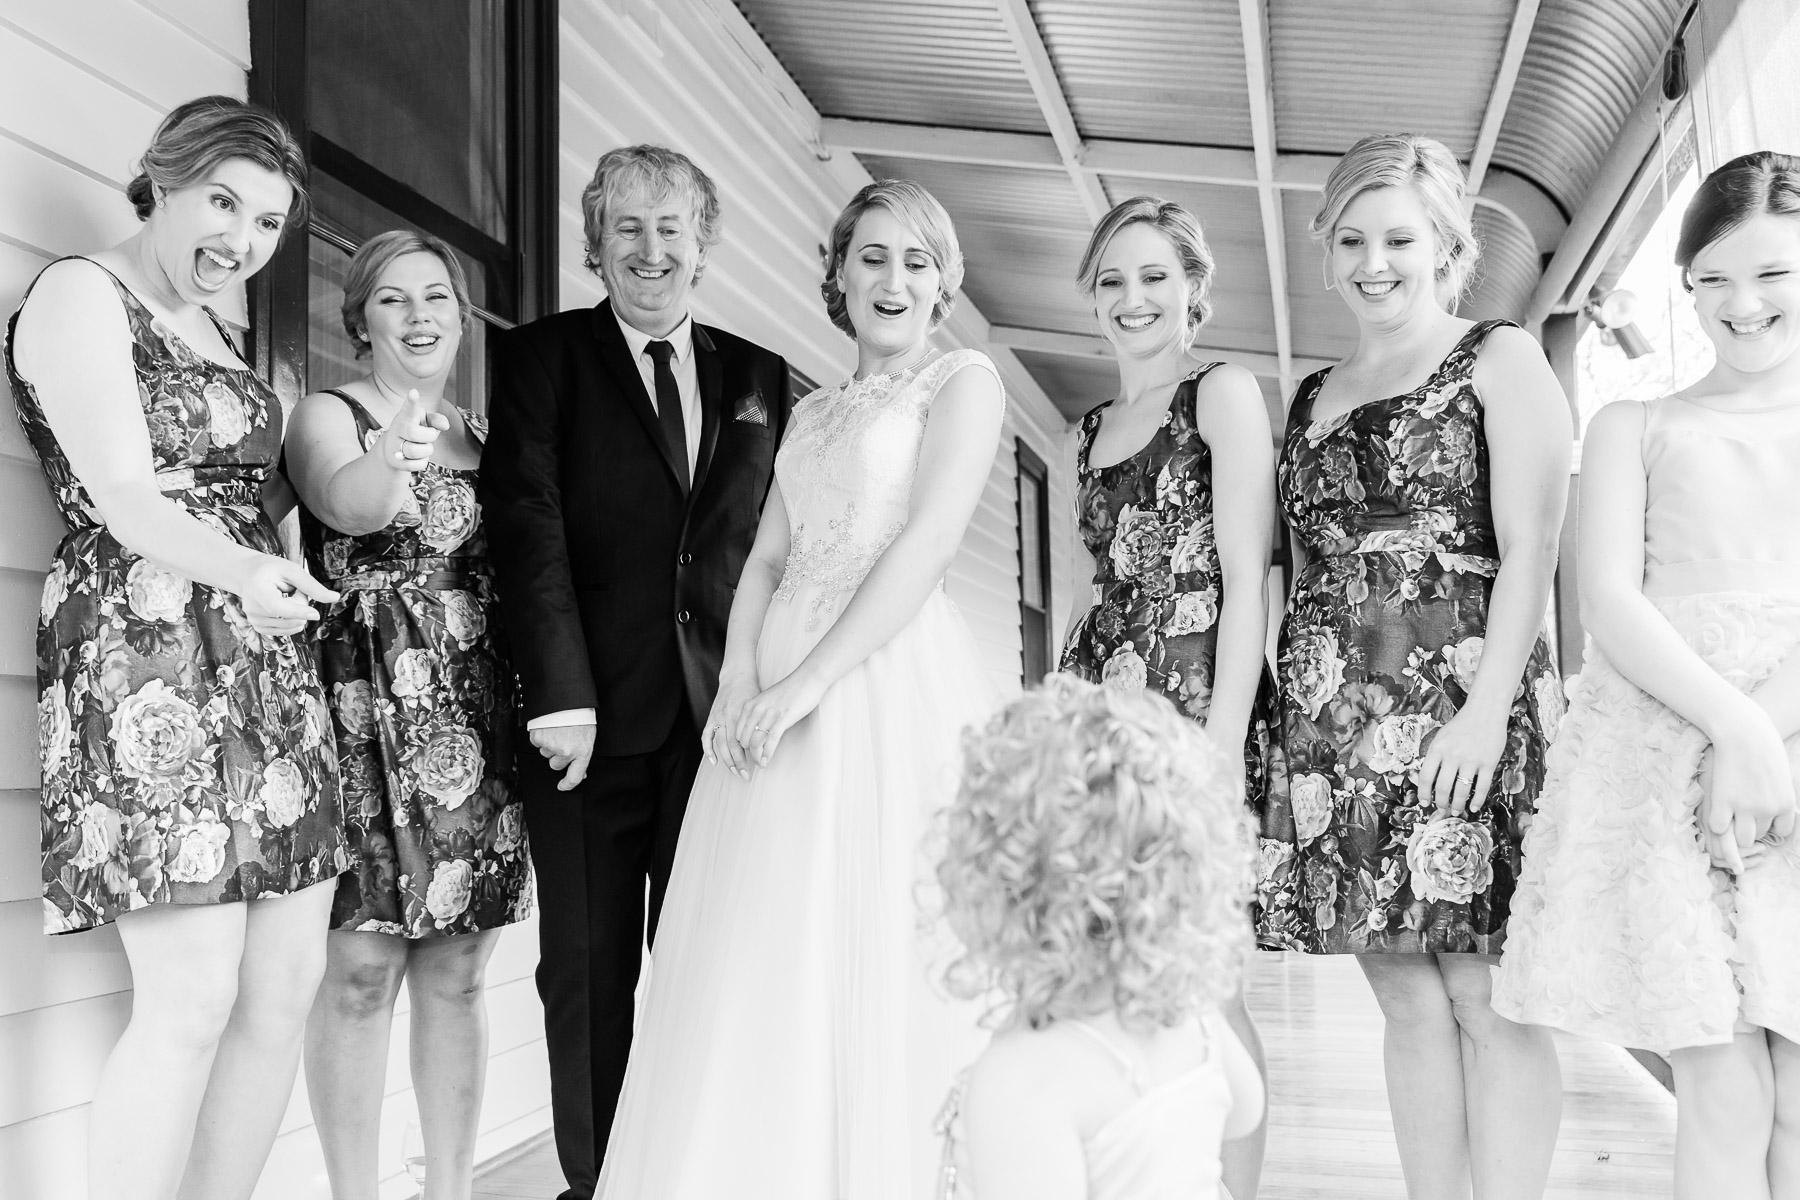 Marnie_and_Charlie_Yarra_Valley_Wedding_Blog-28.jpg